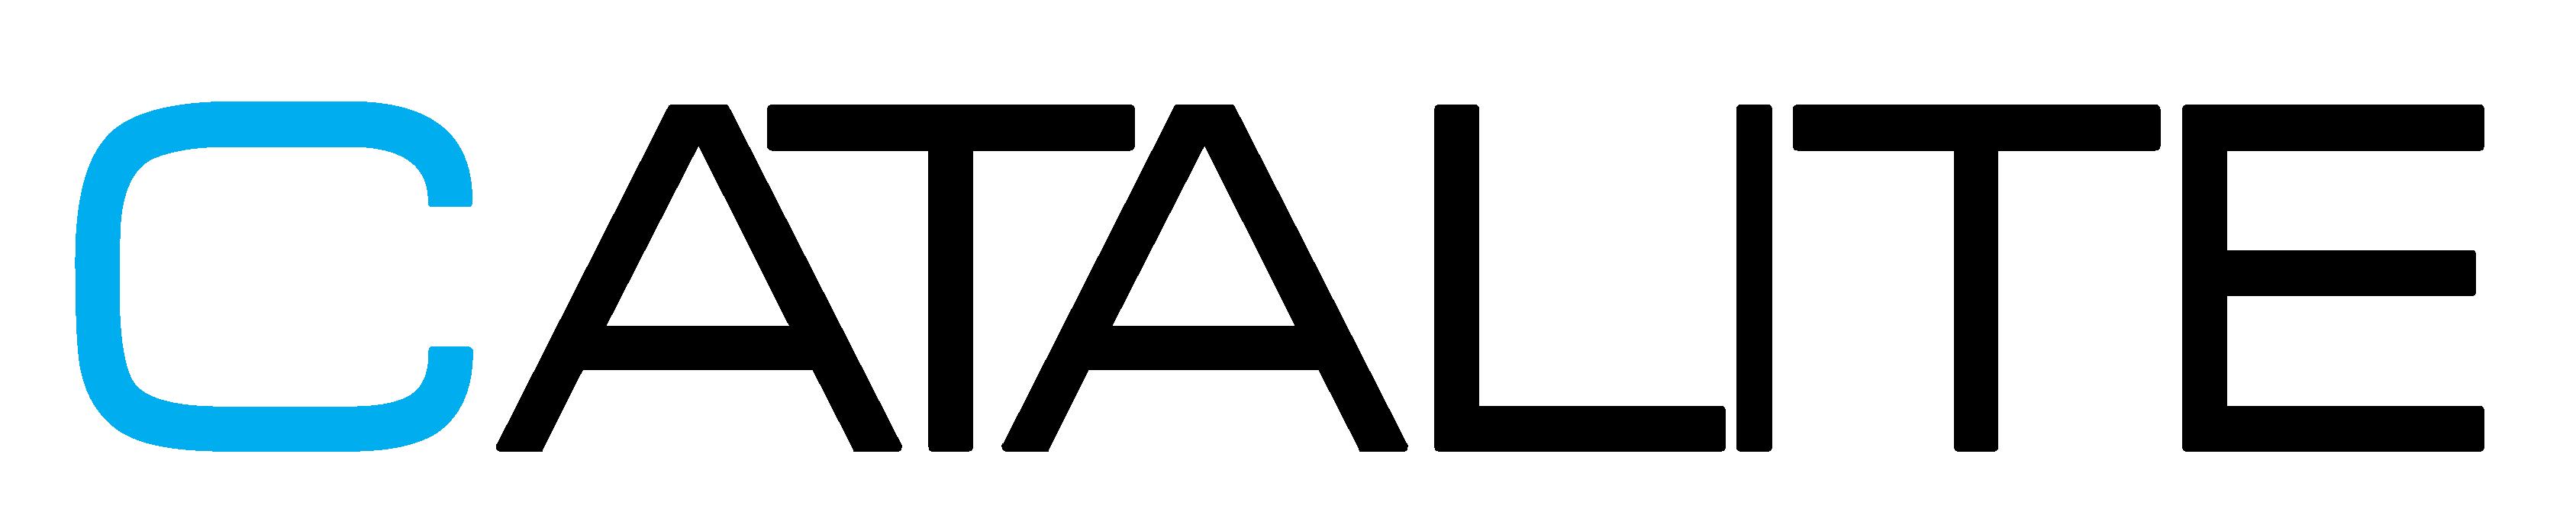 Catalite